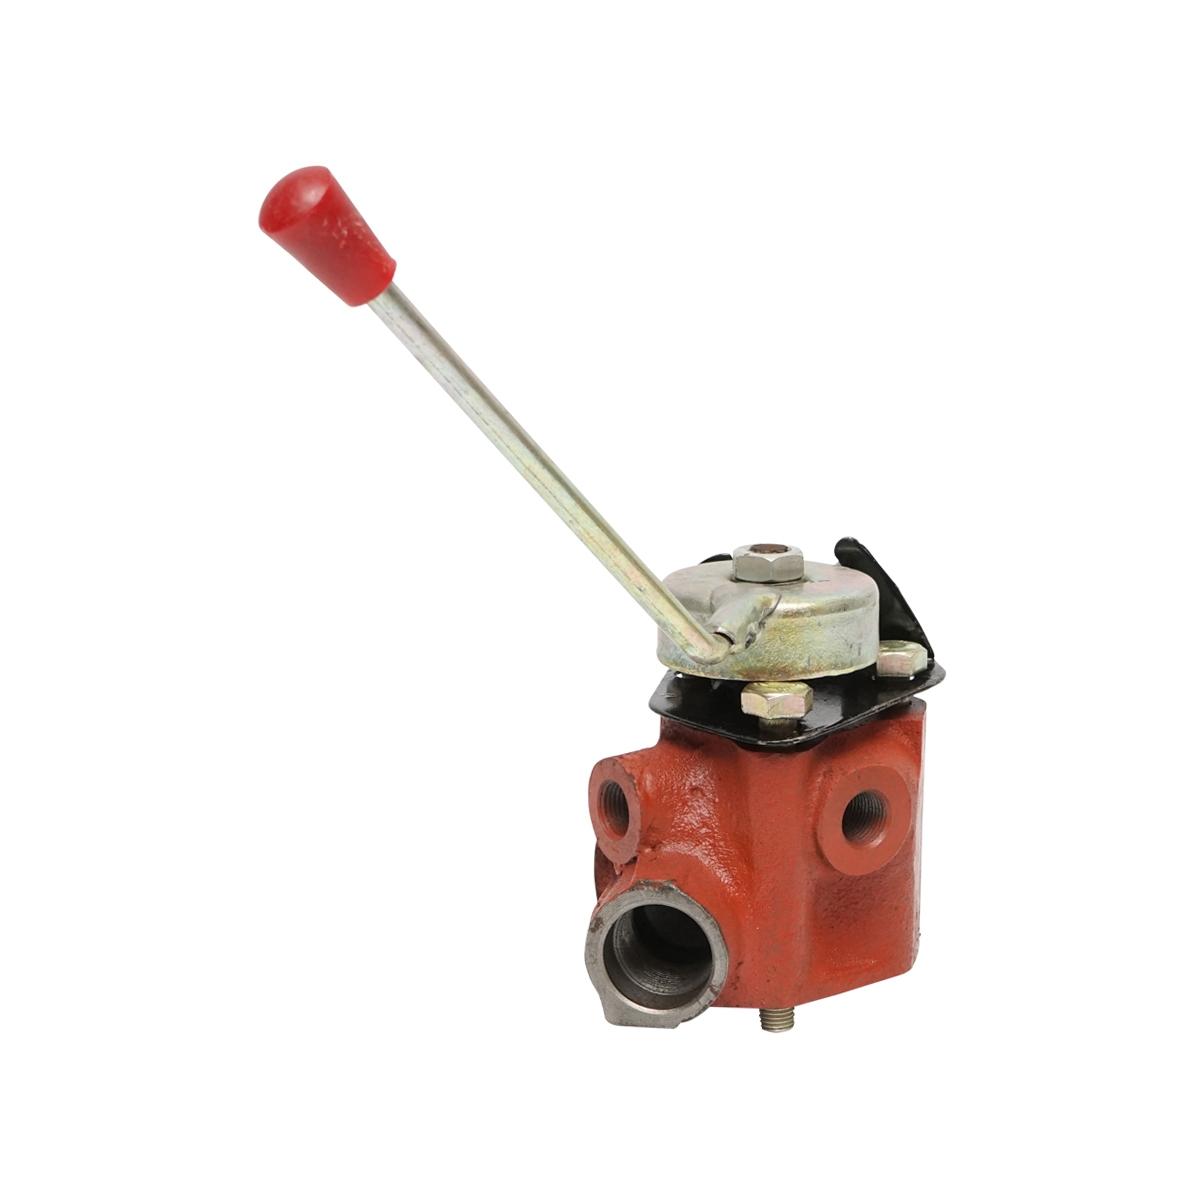 Distribuitor hidraulic cu o maneta tractor UTB 445 Fiat